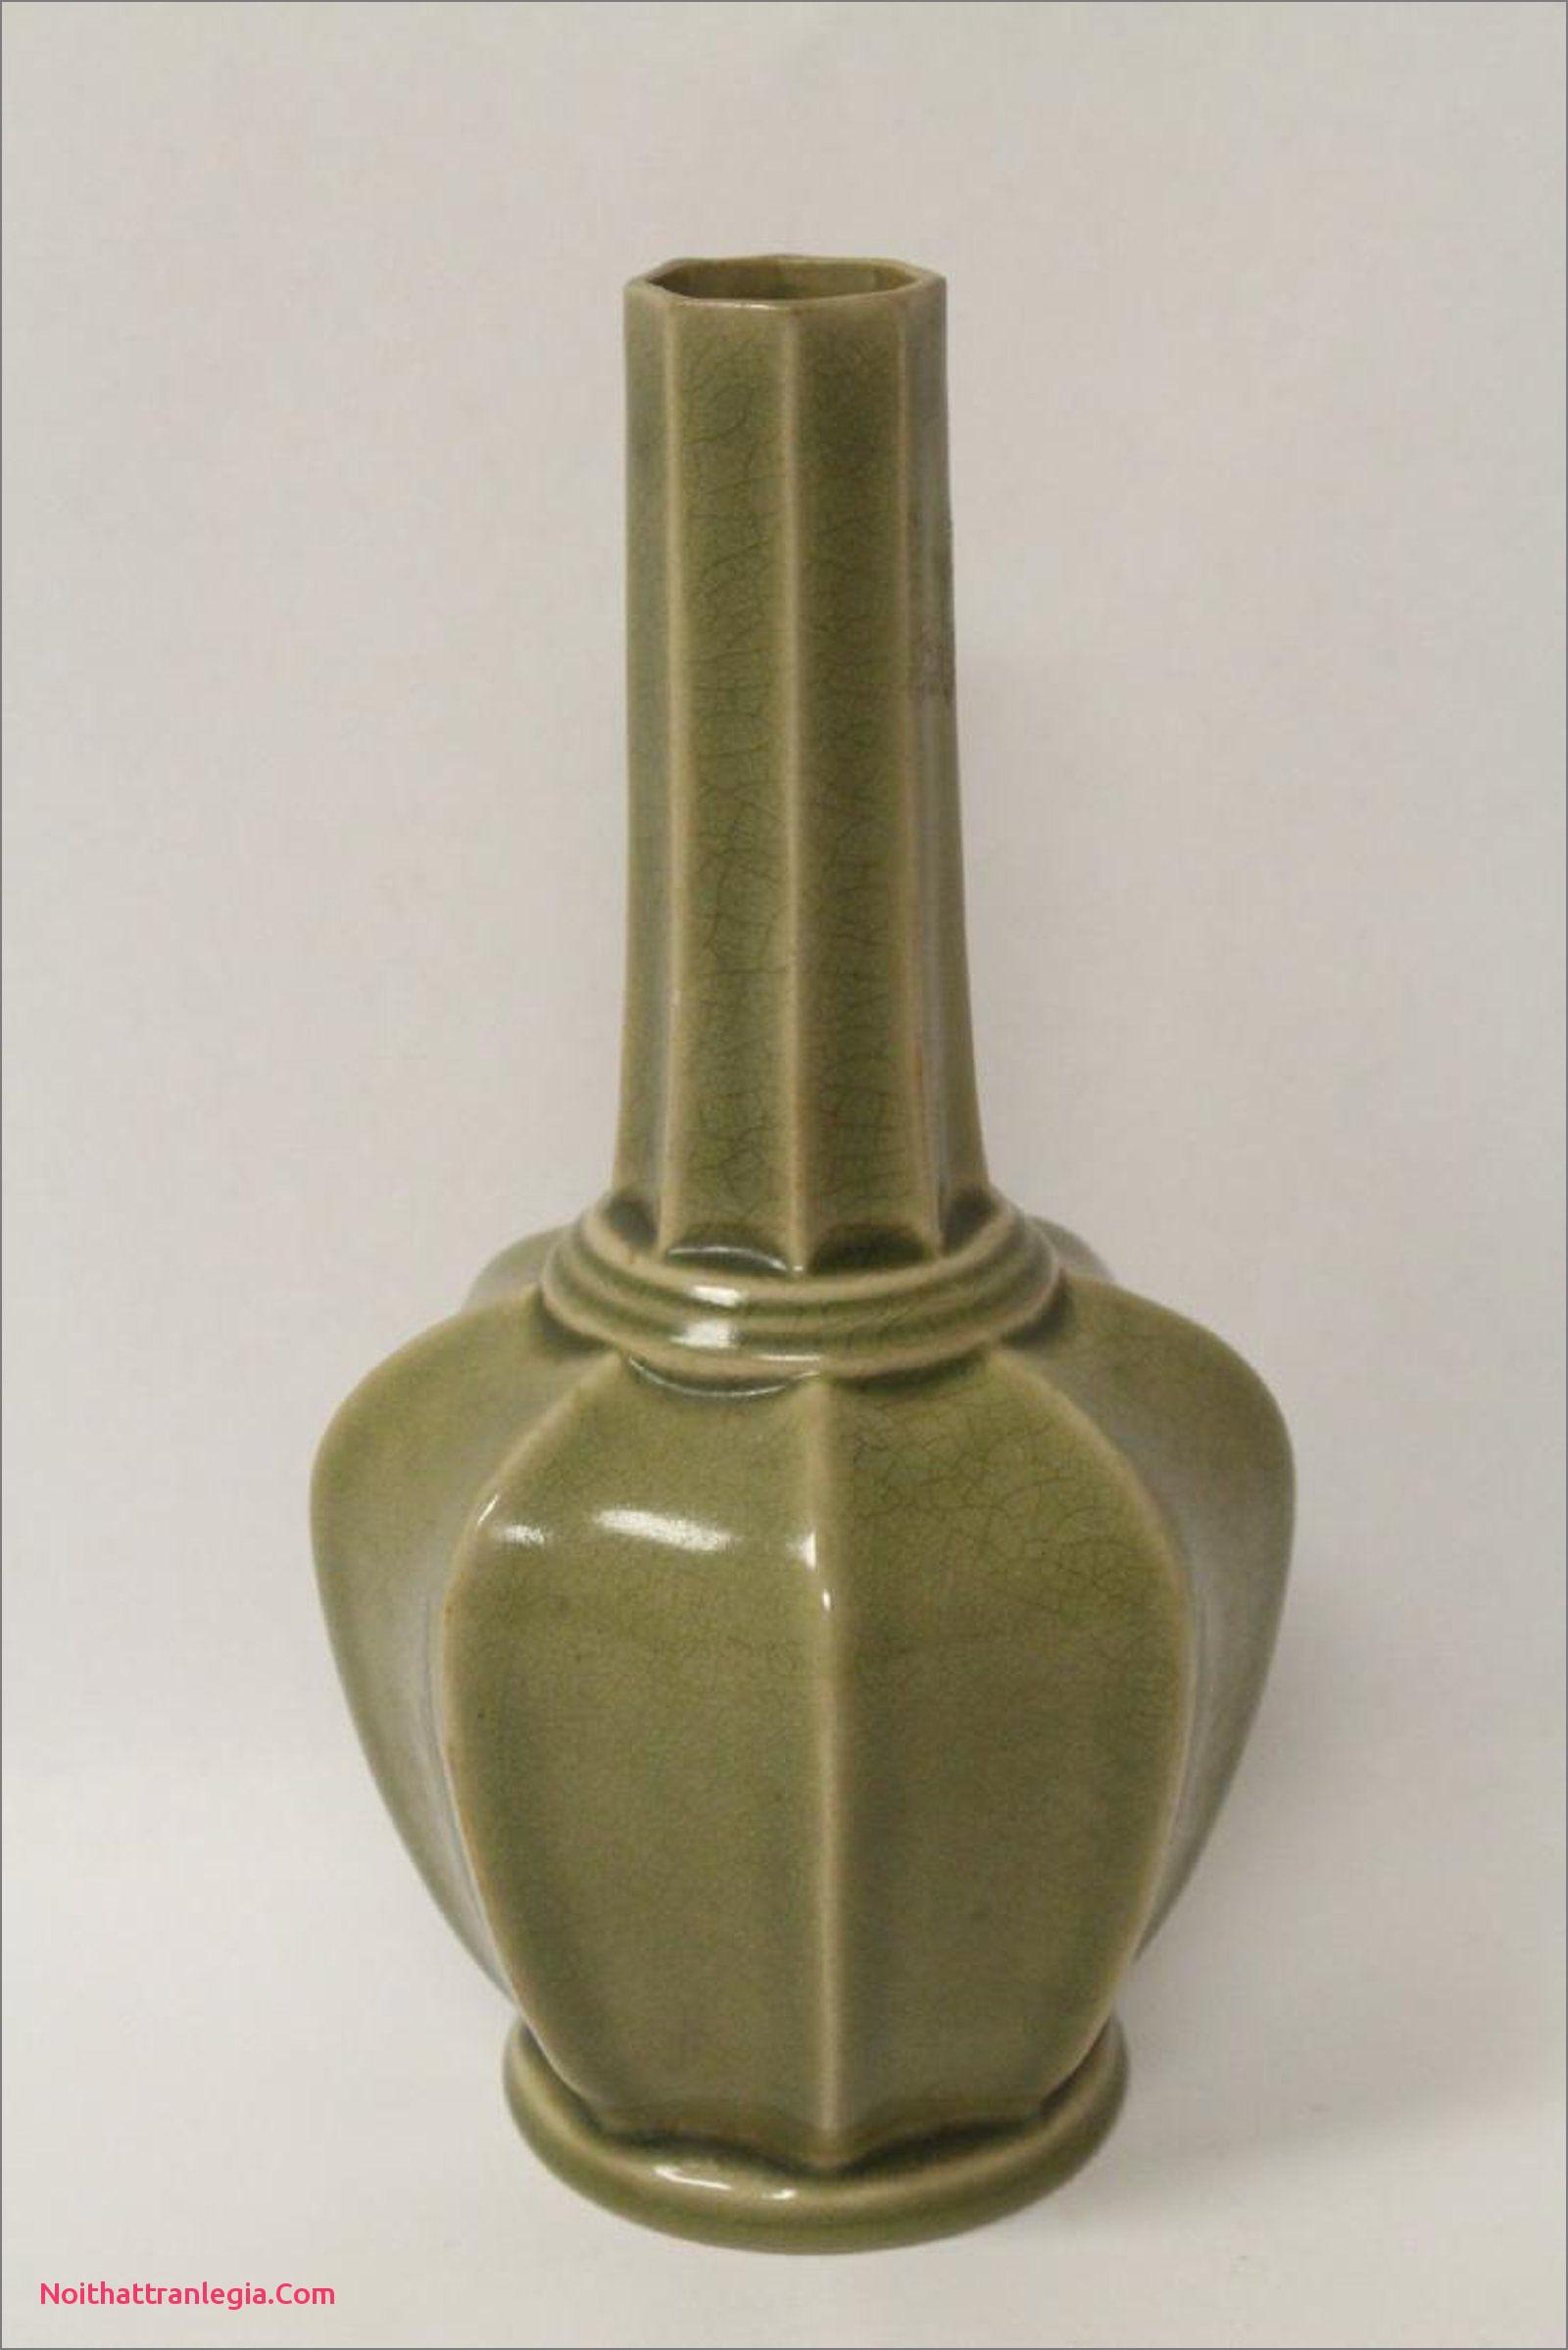 glass ginger vase of 20 chinese antique vase noithattranlegia vases design in chinese song style celadon porcelain vase